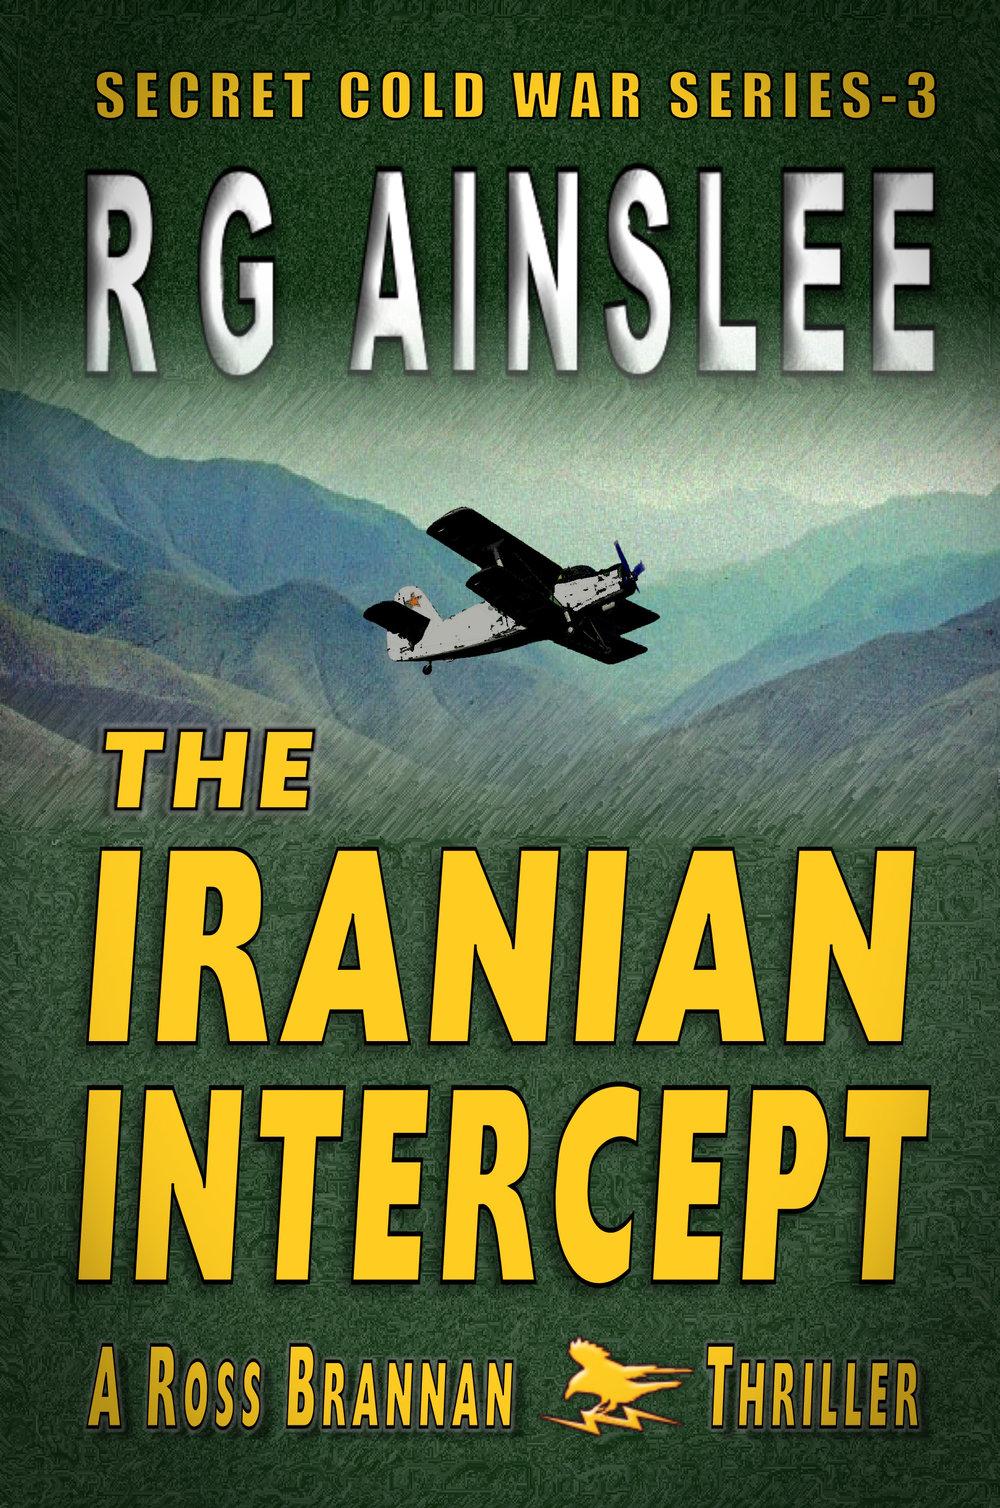 Iranian Intercept Cover 2018.jpg